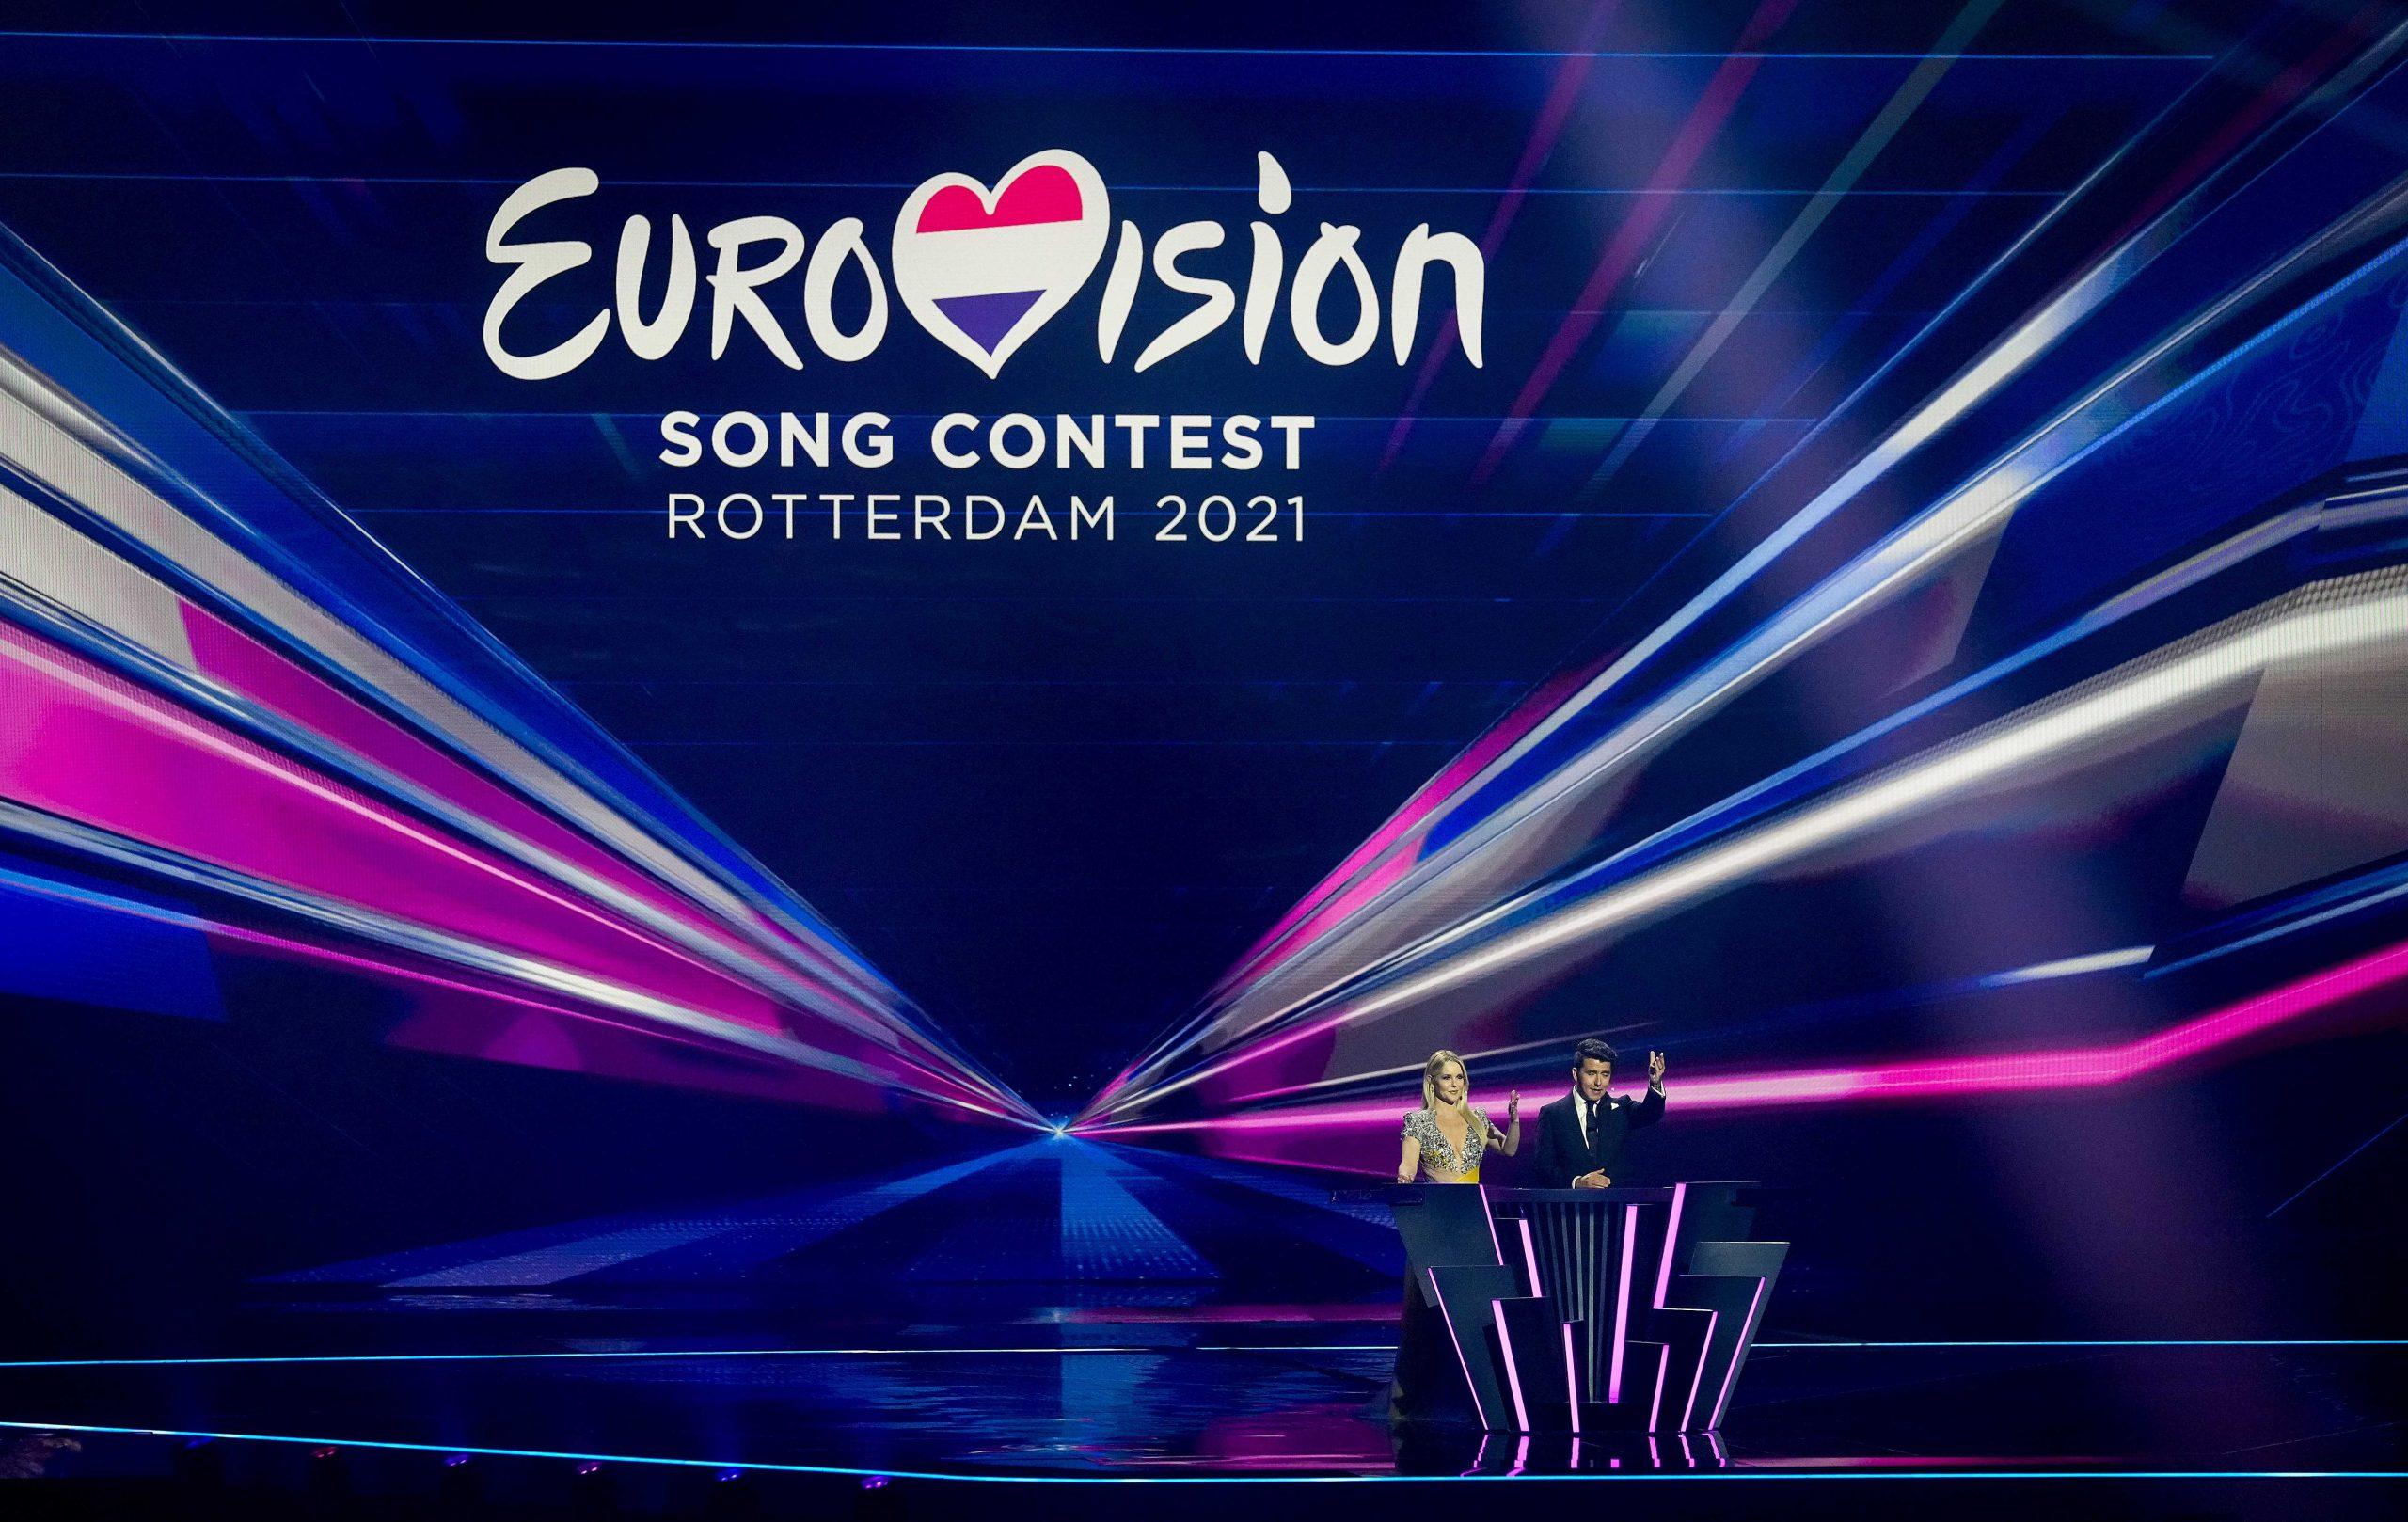 Ko su favoriti za pobedu na Evroviziji 2021? 1